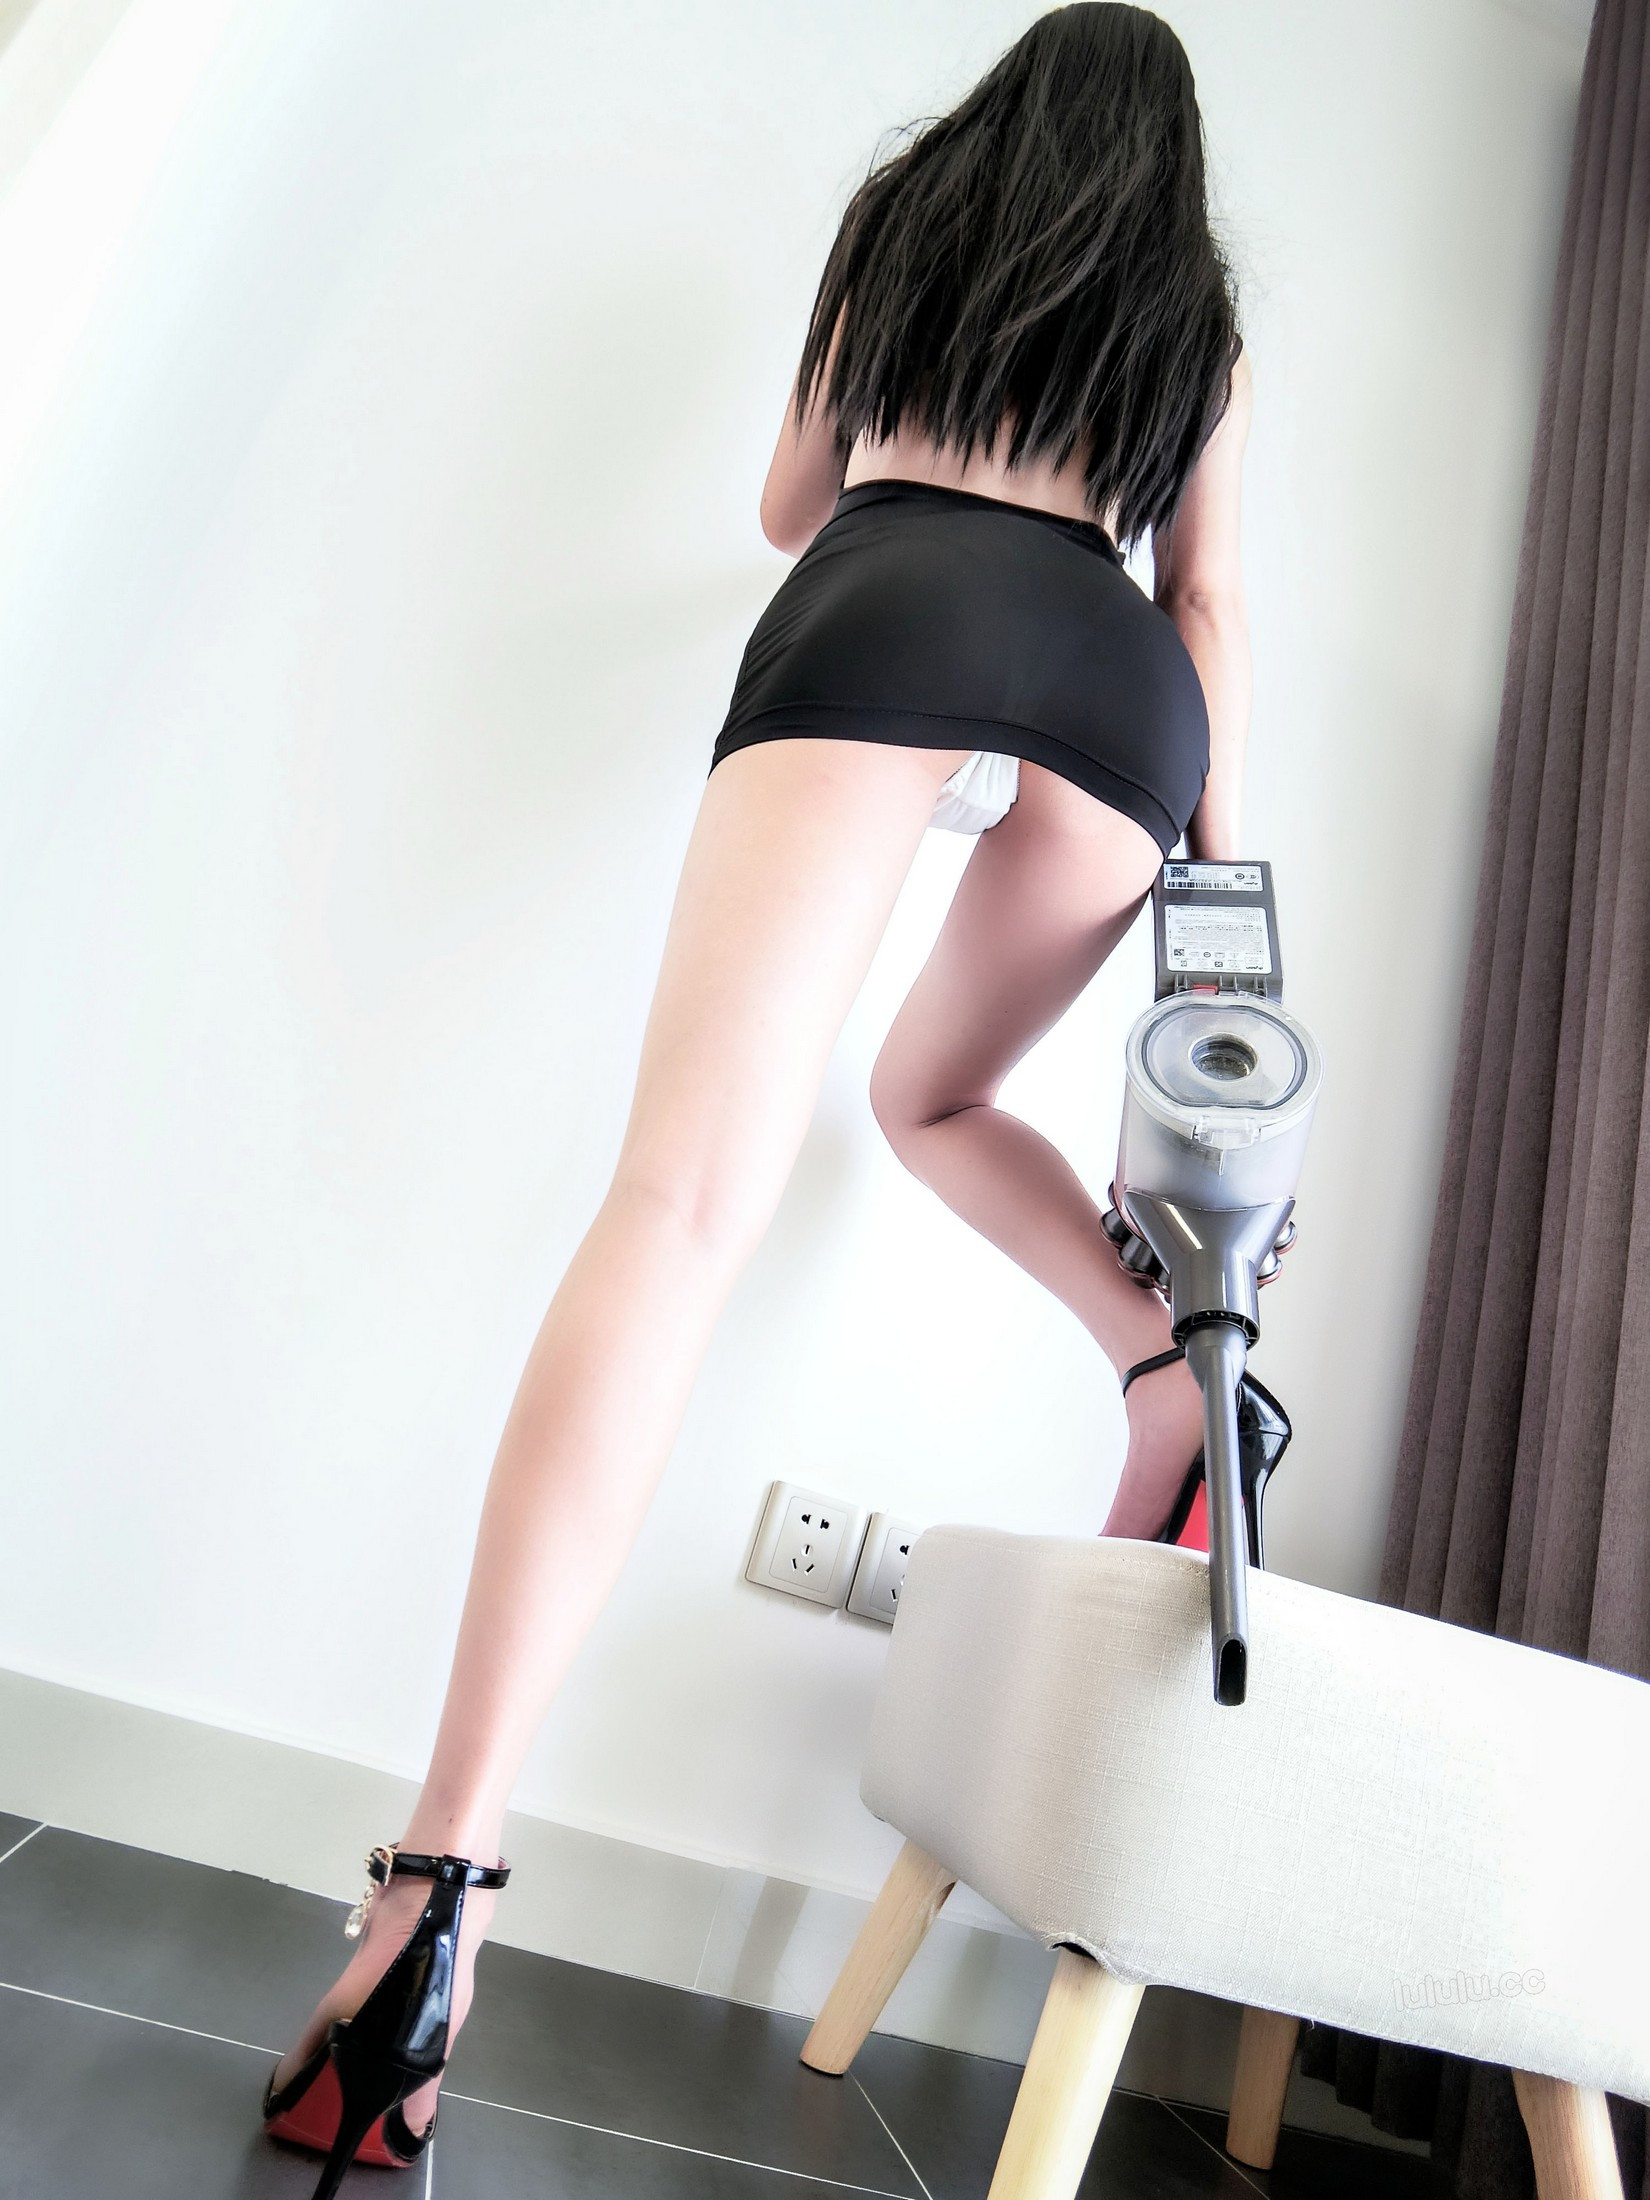 [cosplay] MaSusu - Sexy black skirt cleaning 002